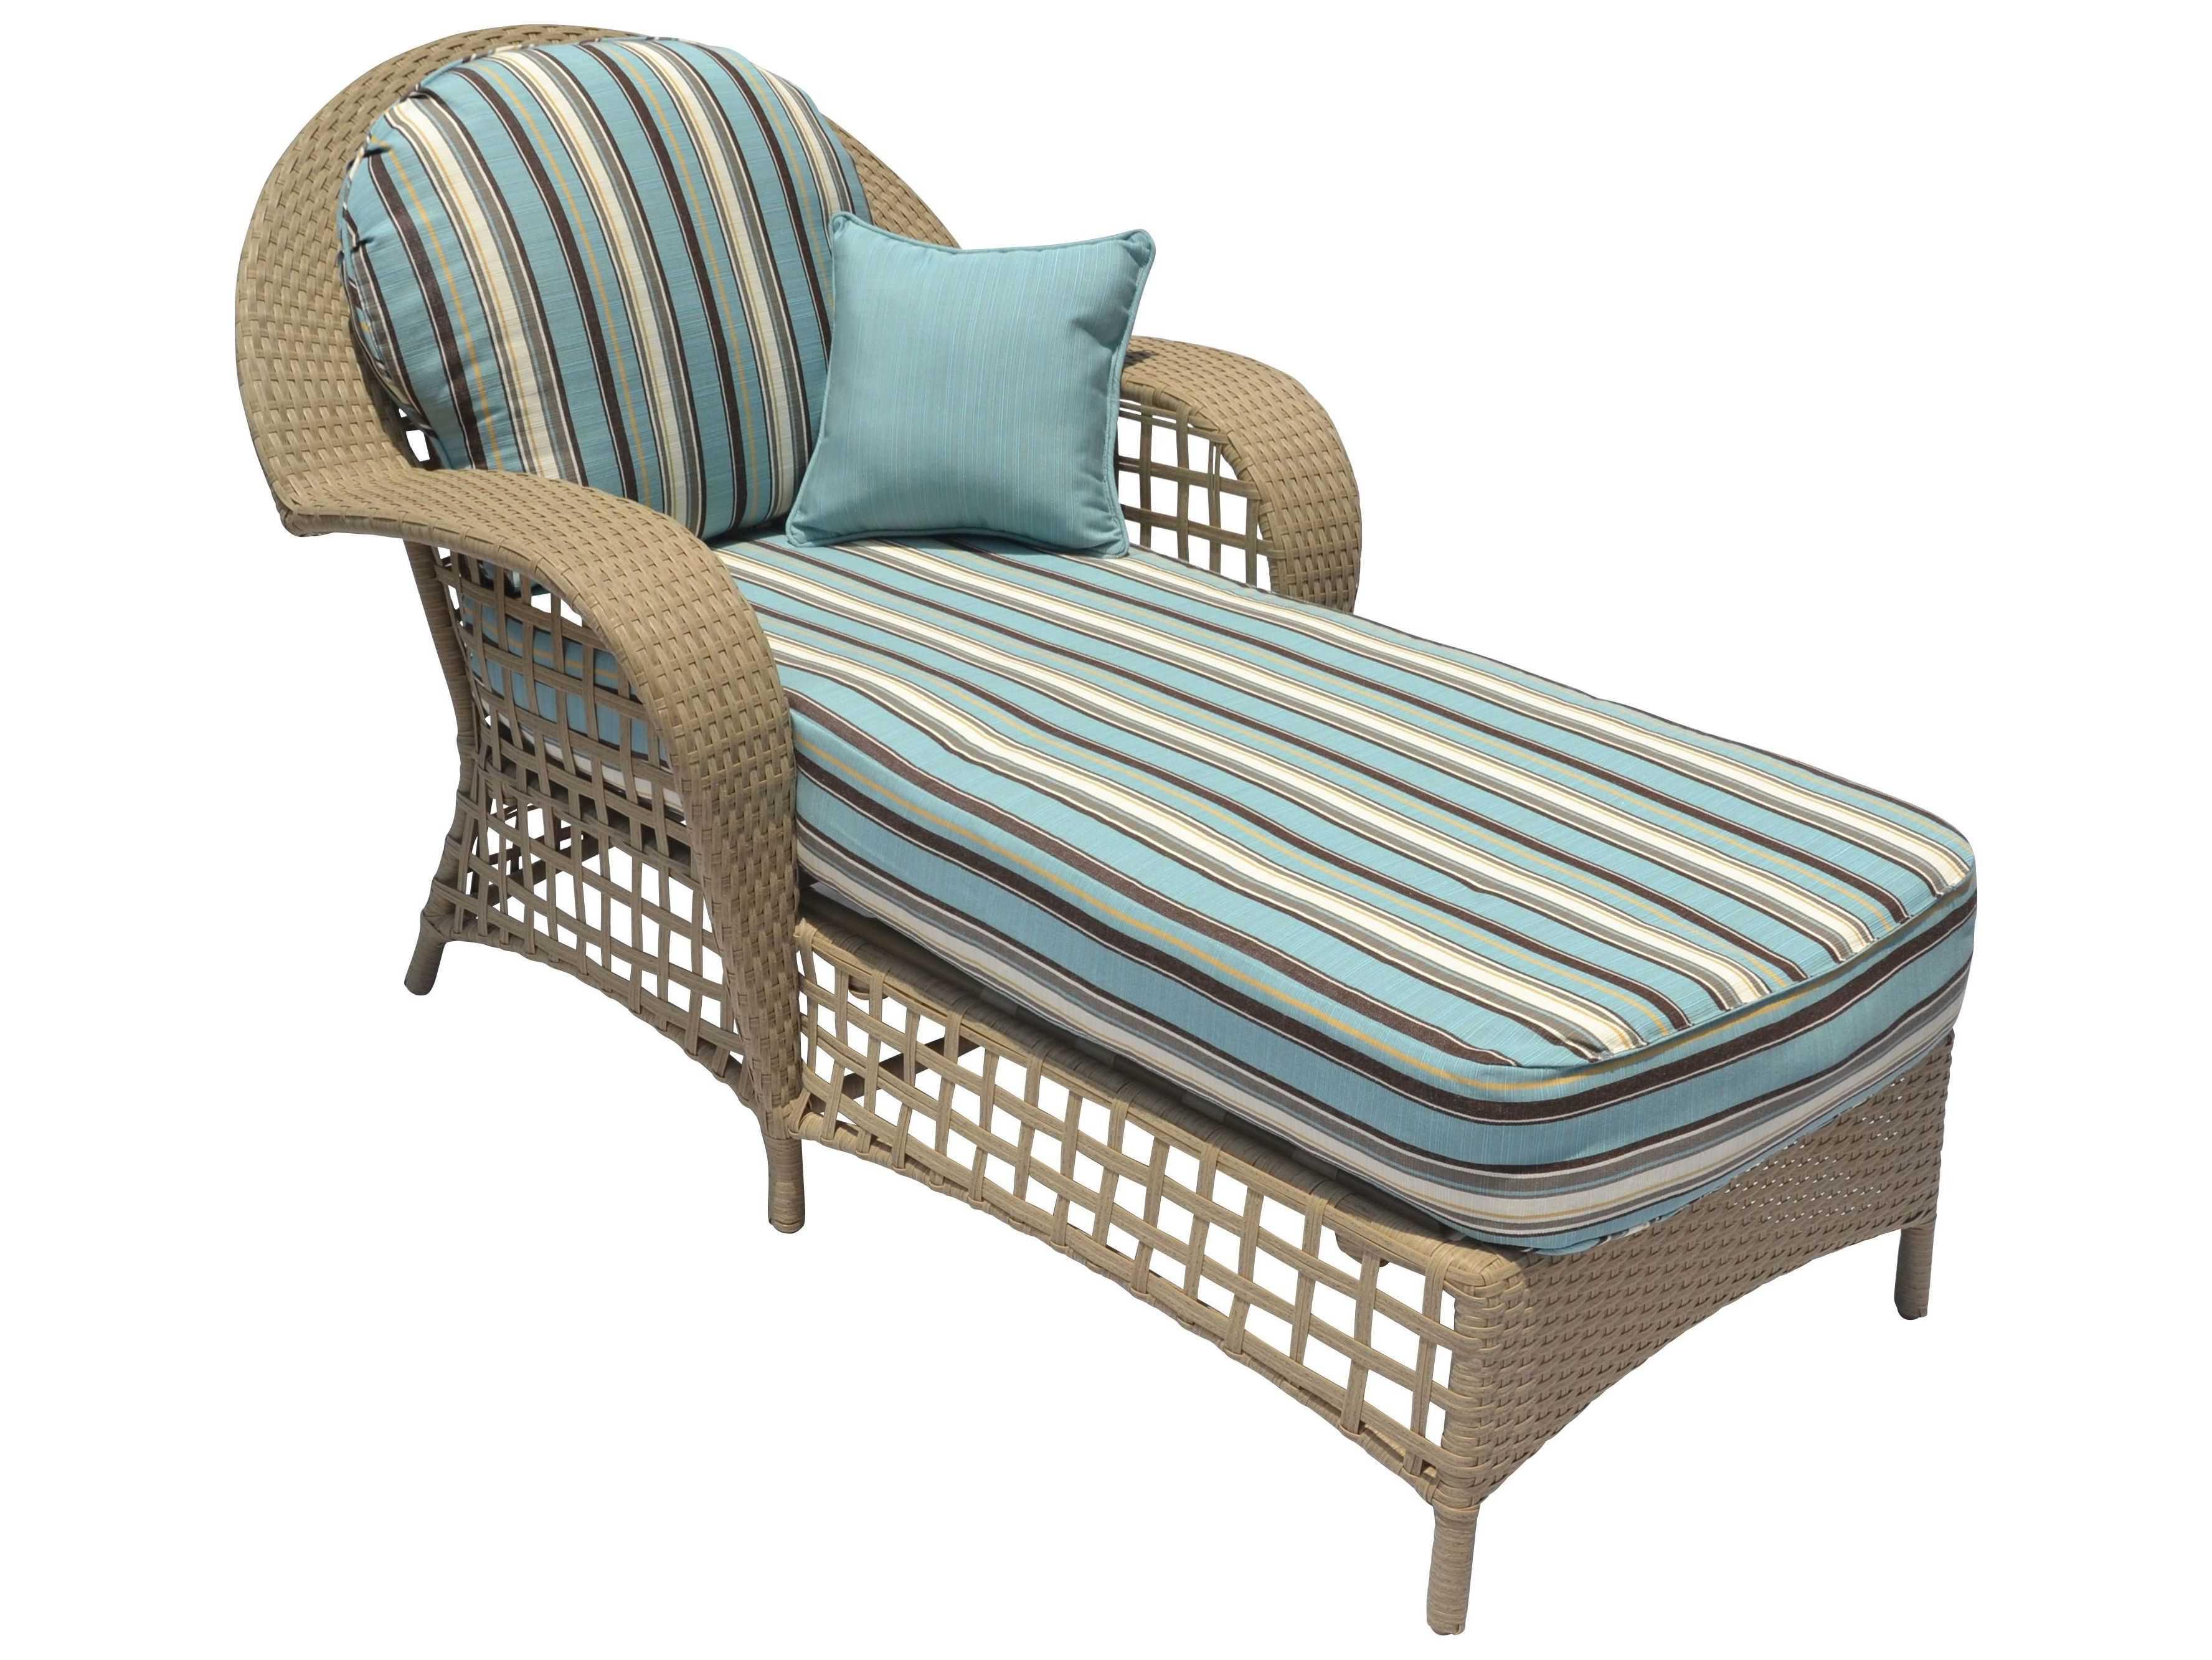 Suncoast Sedona Wicker Chaise Lounge  SU12933